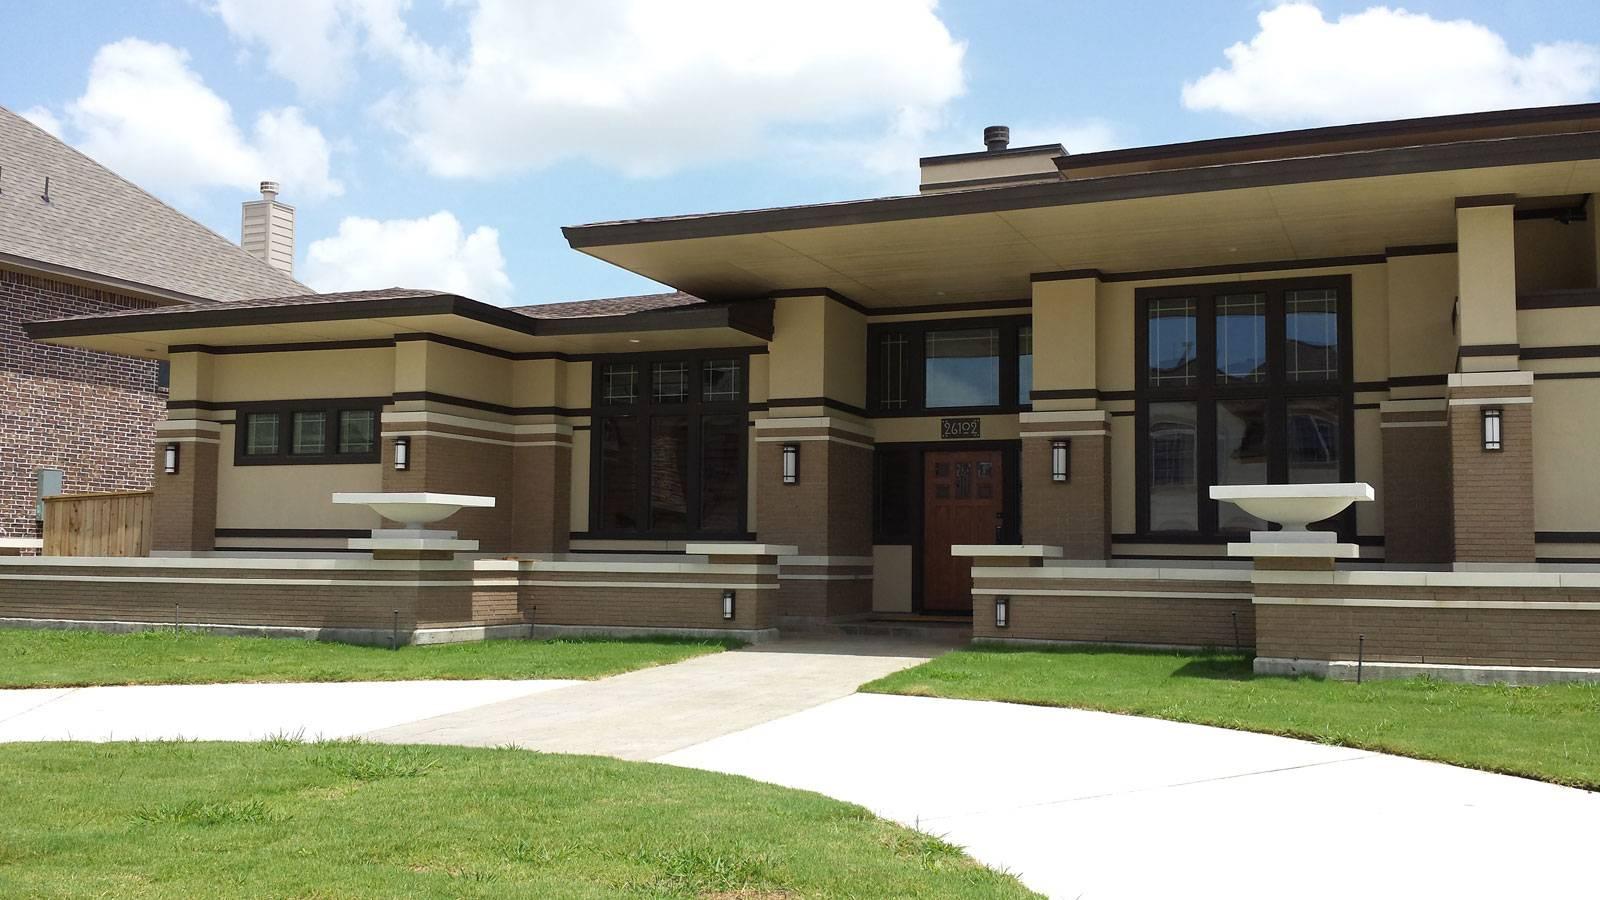 Frank Lloyd Wright Inspired Houses frank lloyd wright inspired homes - house plans | #52622